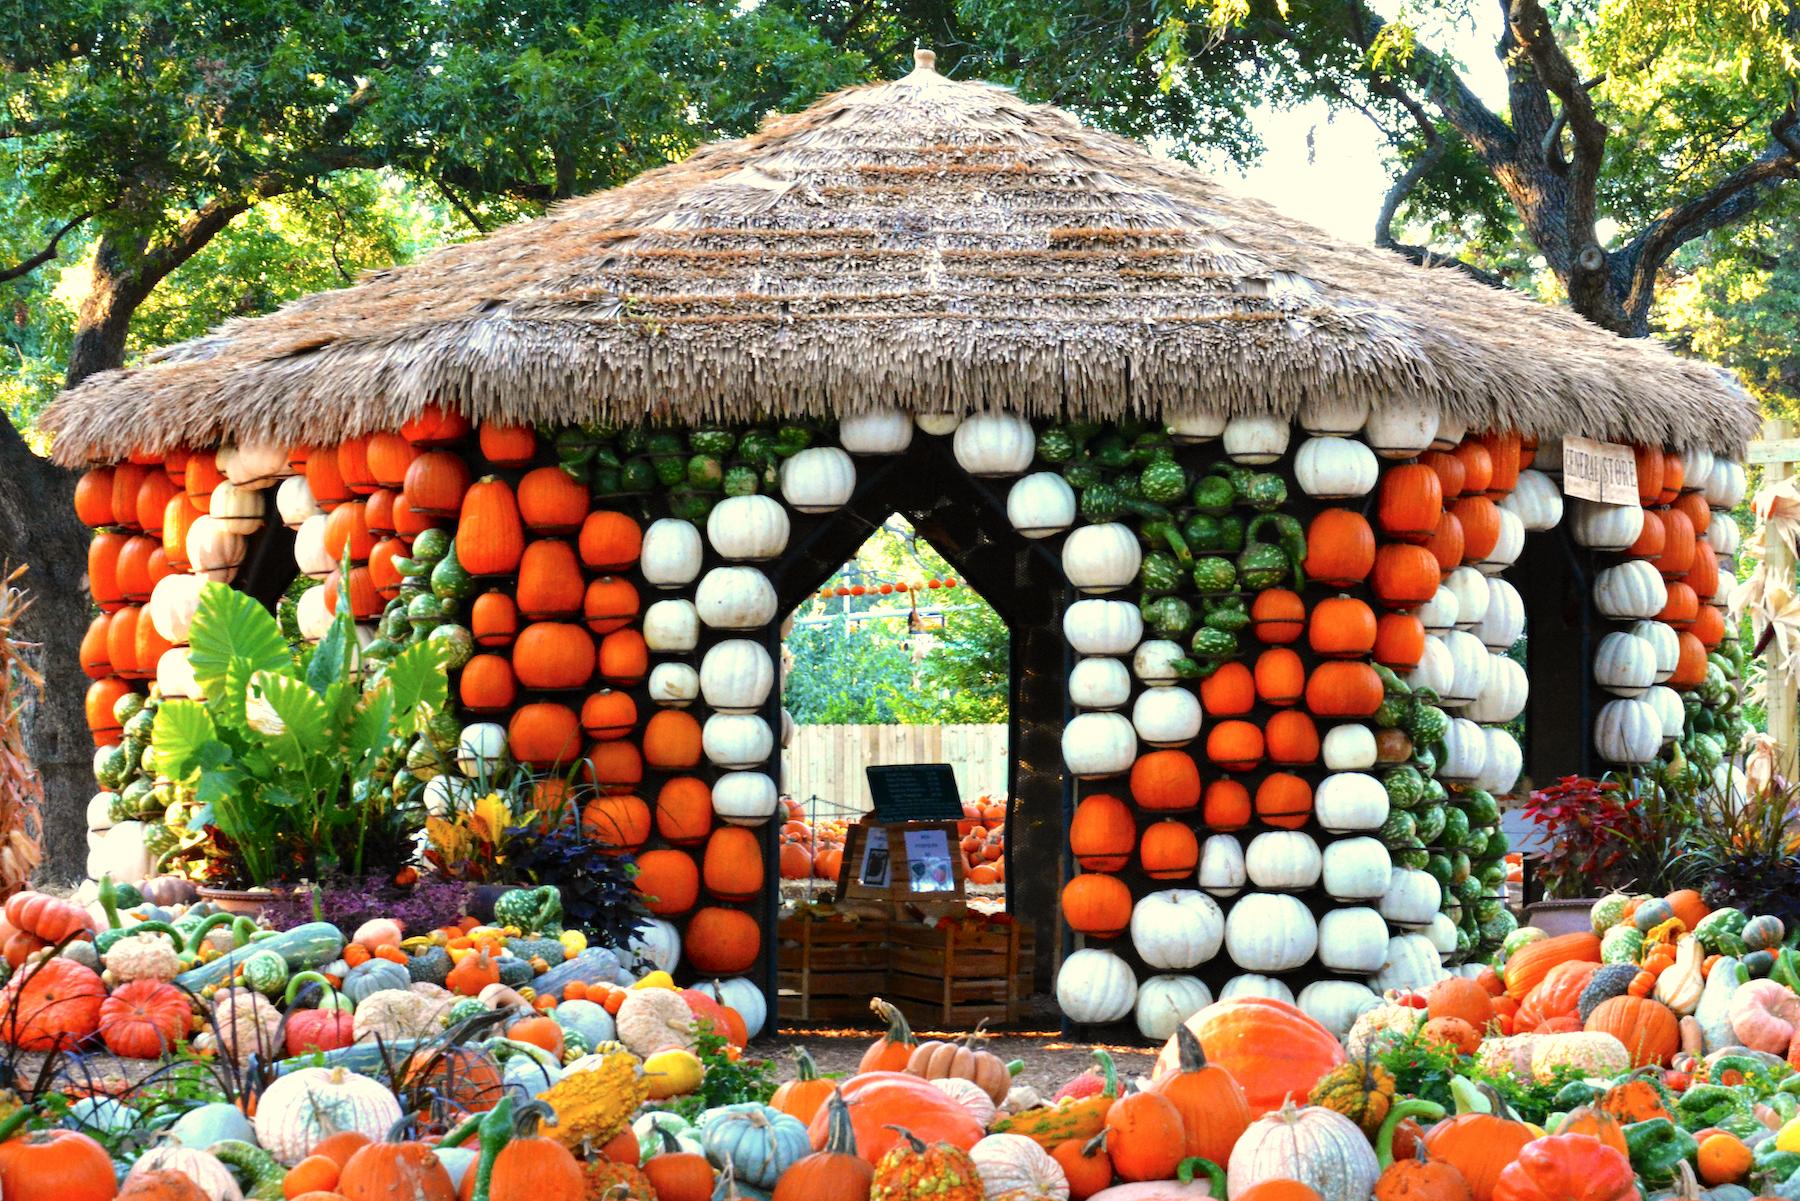 The 2020 Pumpkin Village at the Dallas Arboretum.